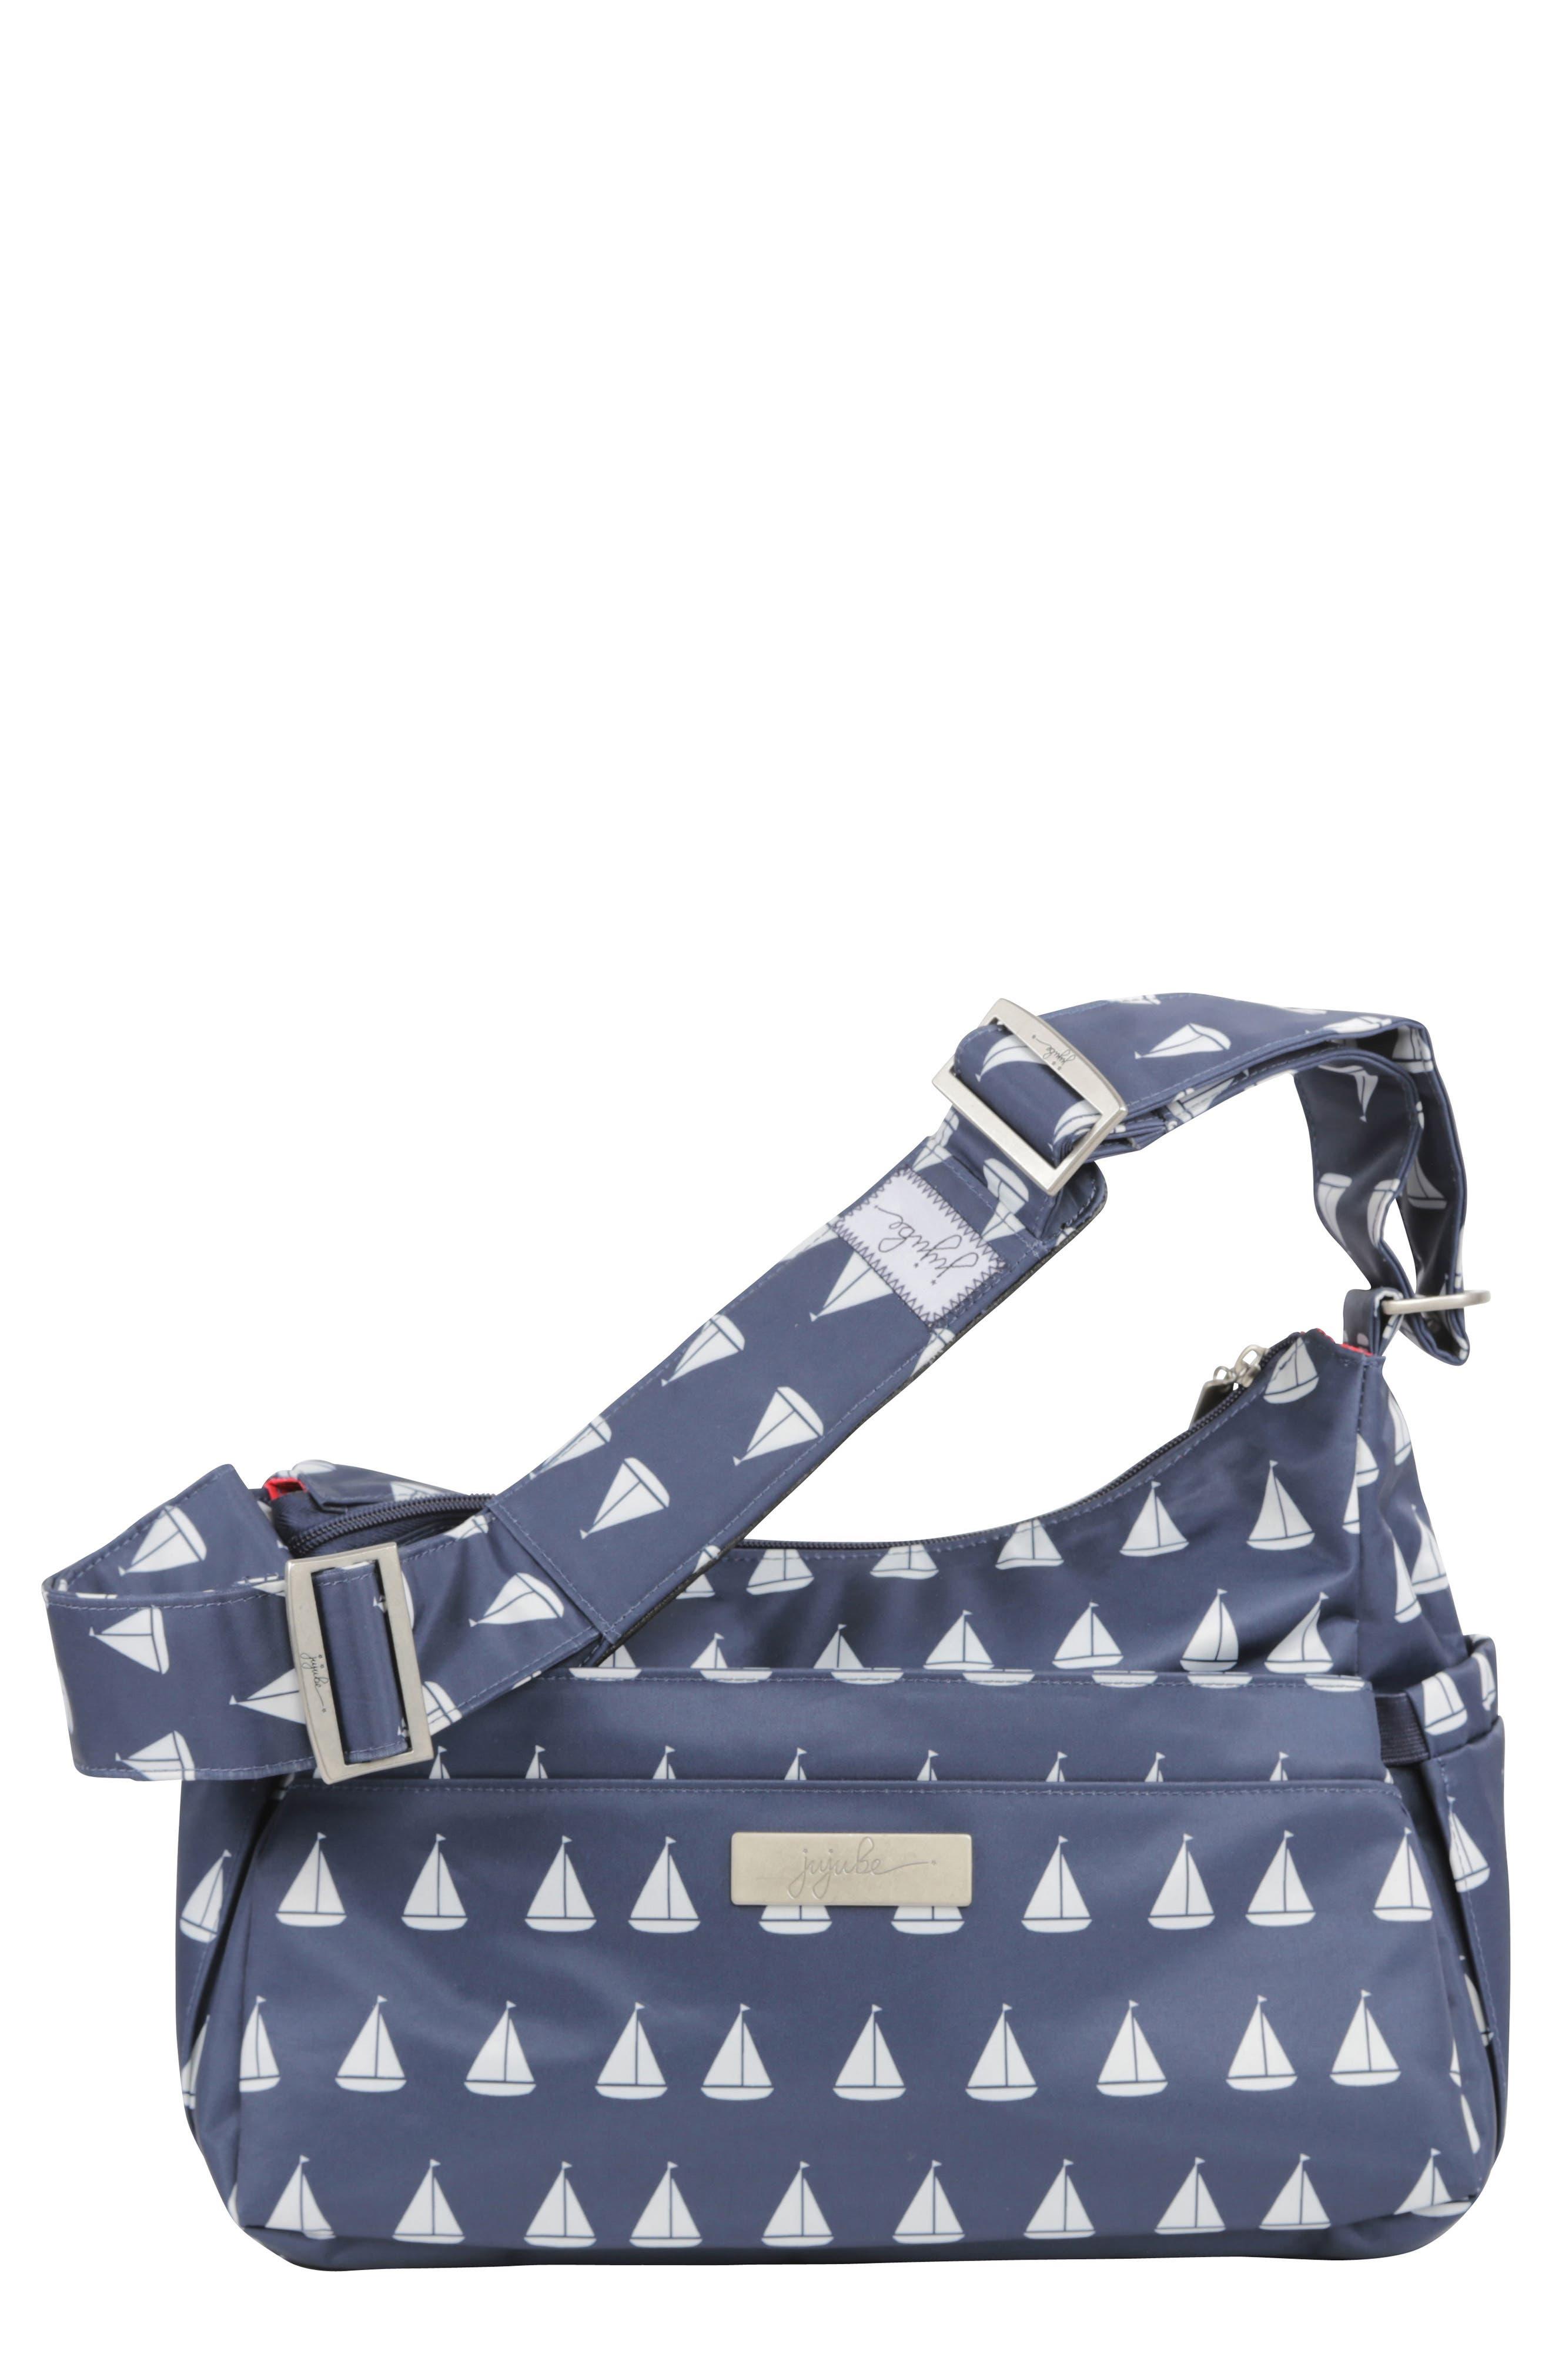 Main Image - Ju-Ju-Be HoboBe - Coastal Collection Diaper Bag